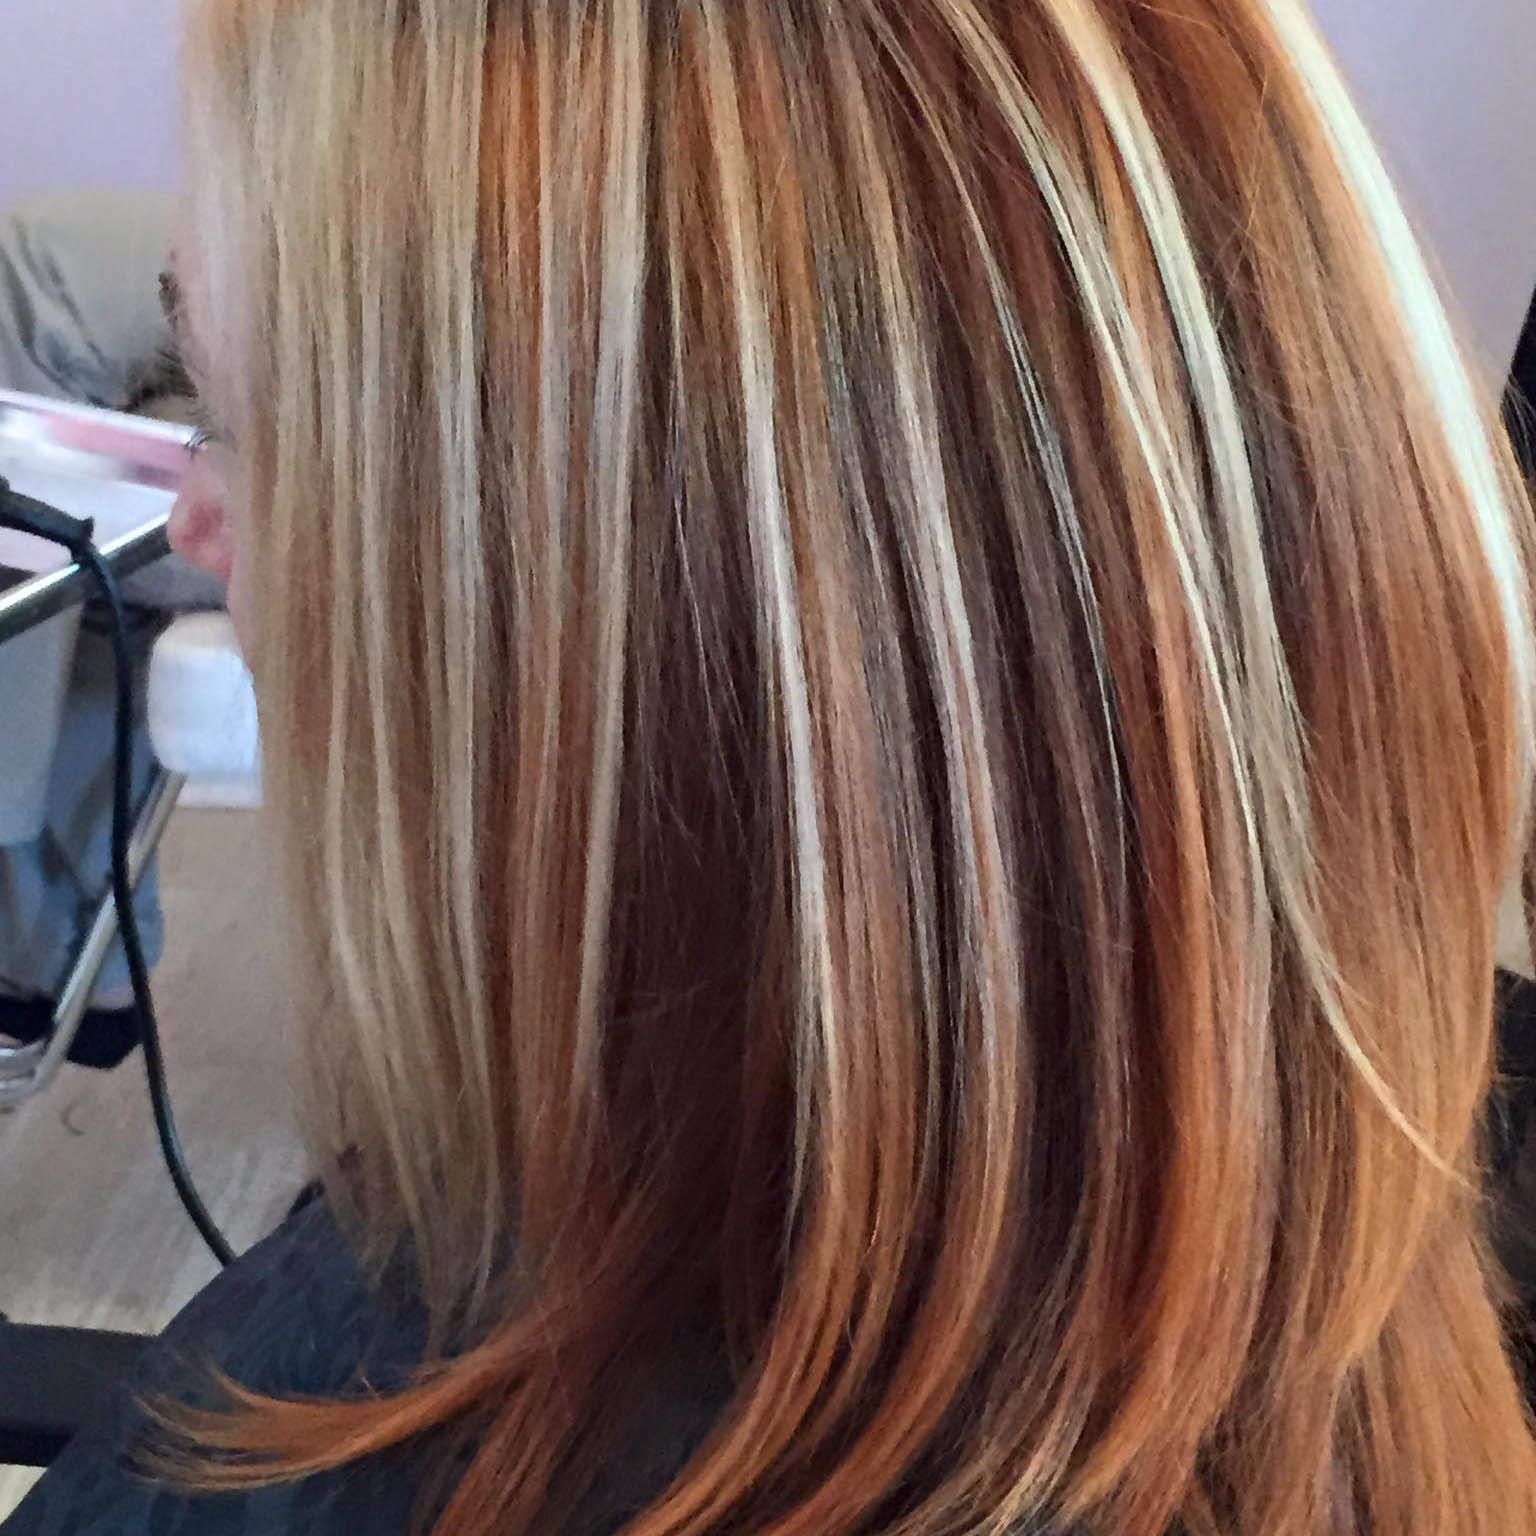 What Is Hair Dimensons?